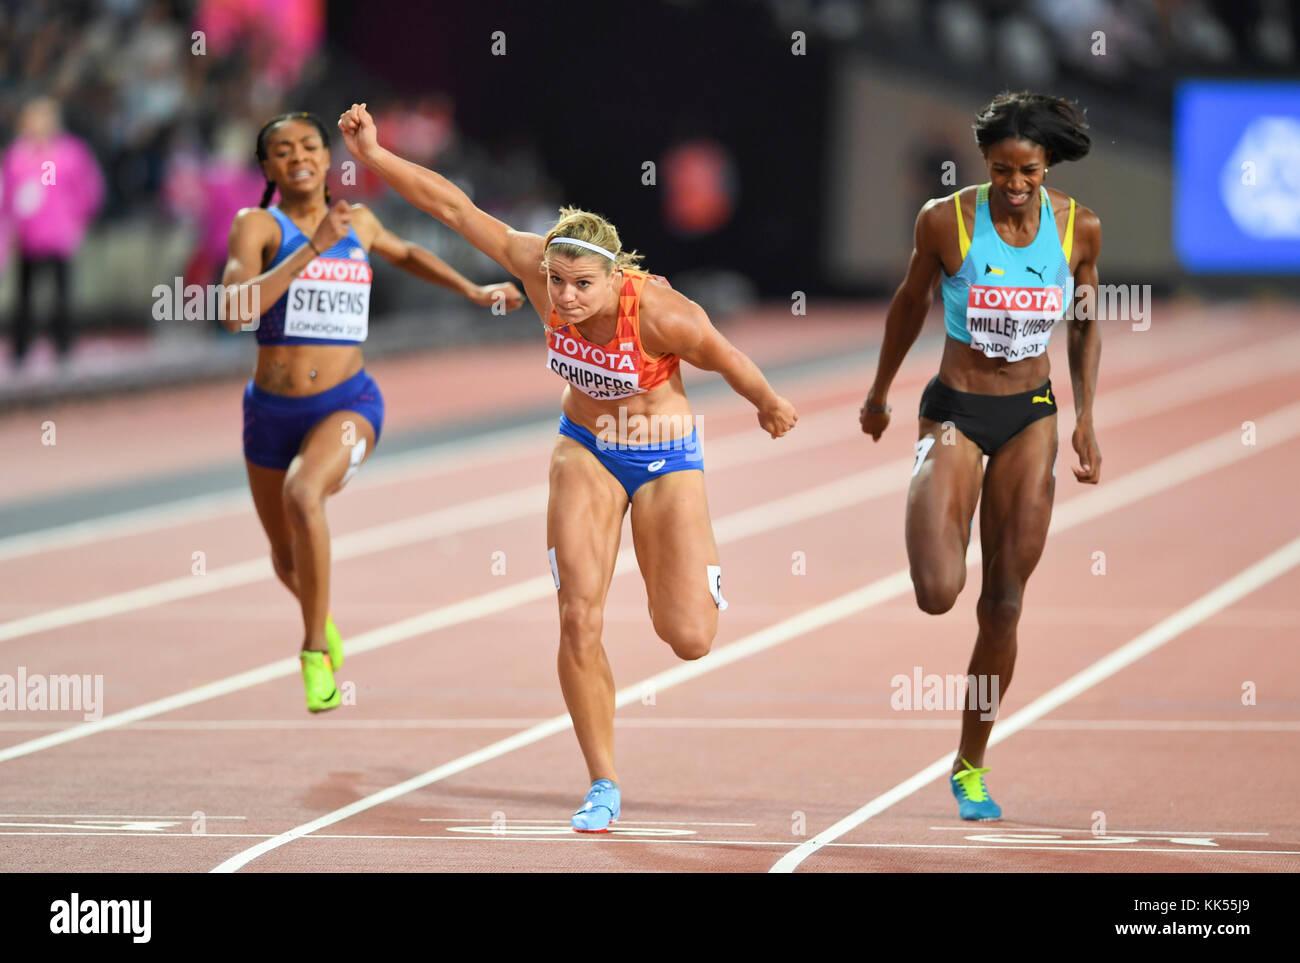 Dafne Schippers - 200m donne Medaglia d'Oro - IAAF World Championships Londra 2017 Immagini Stock